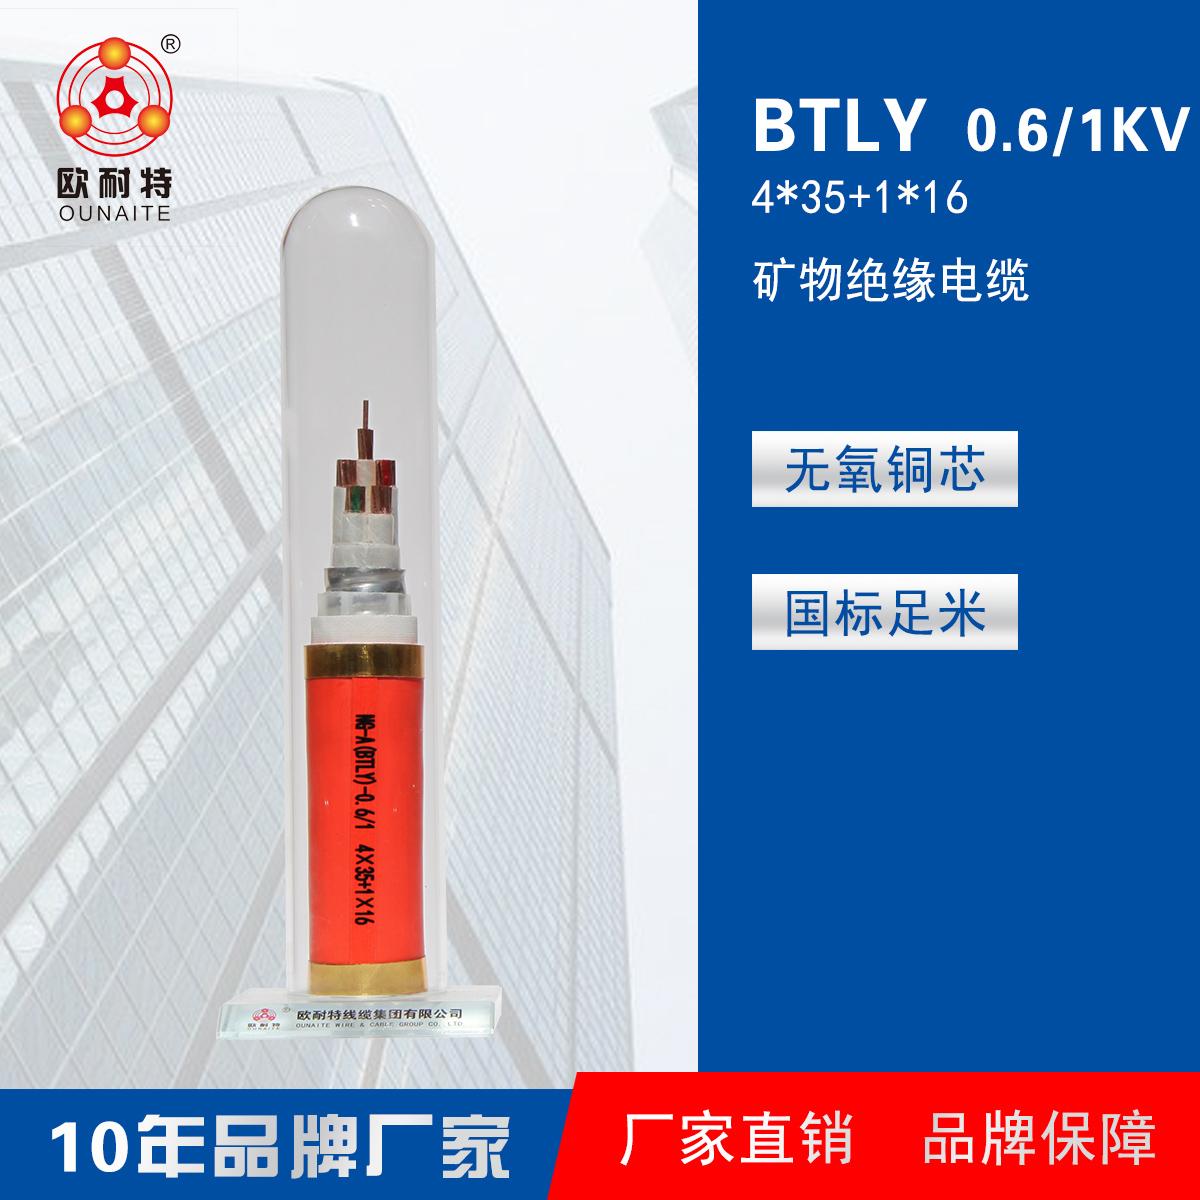 矿物绝缘防火电缆NG-A(BTLY) 0.6/1KV  4*35+1*16